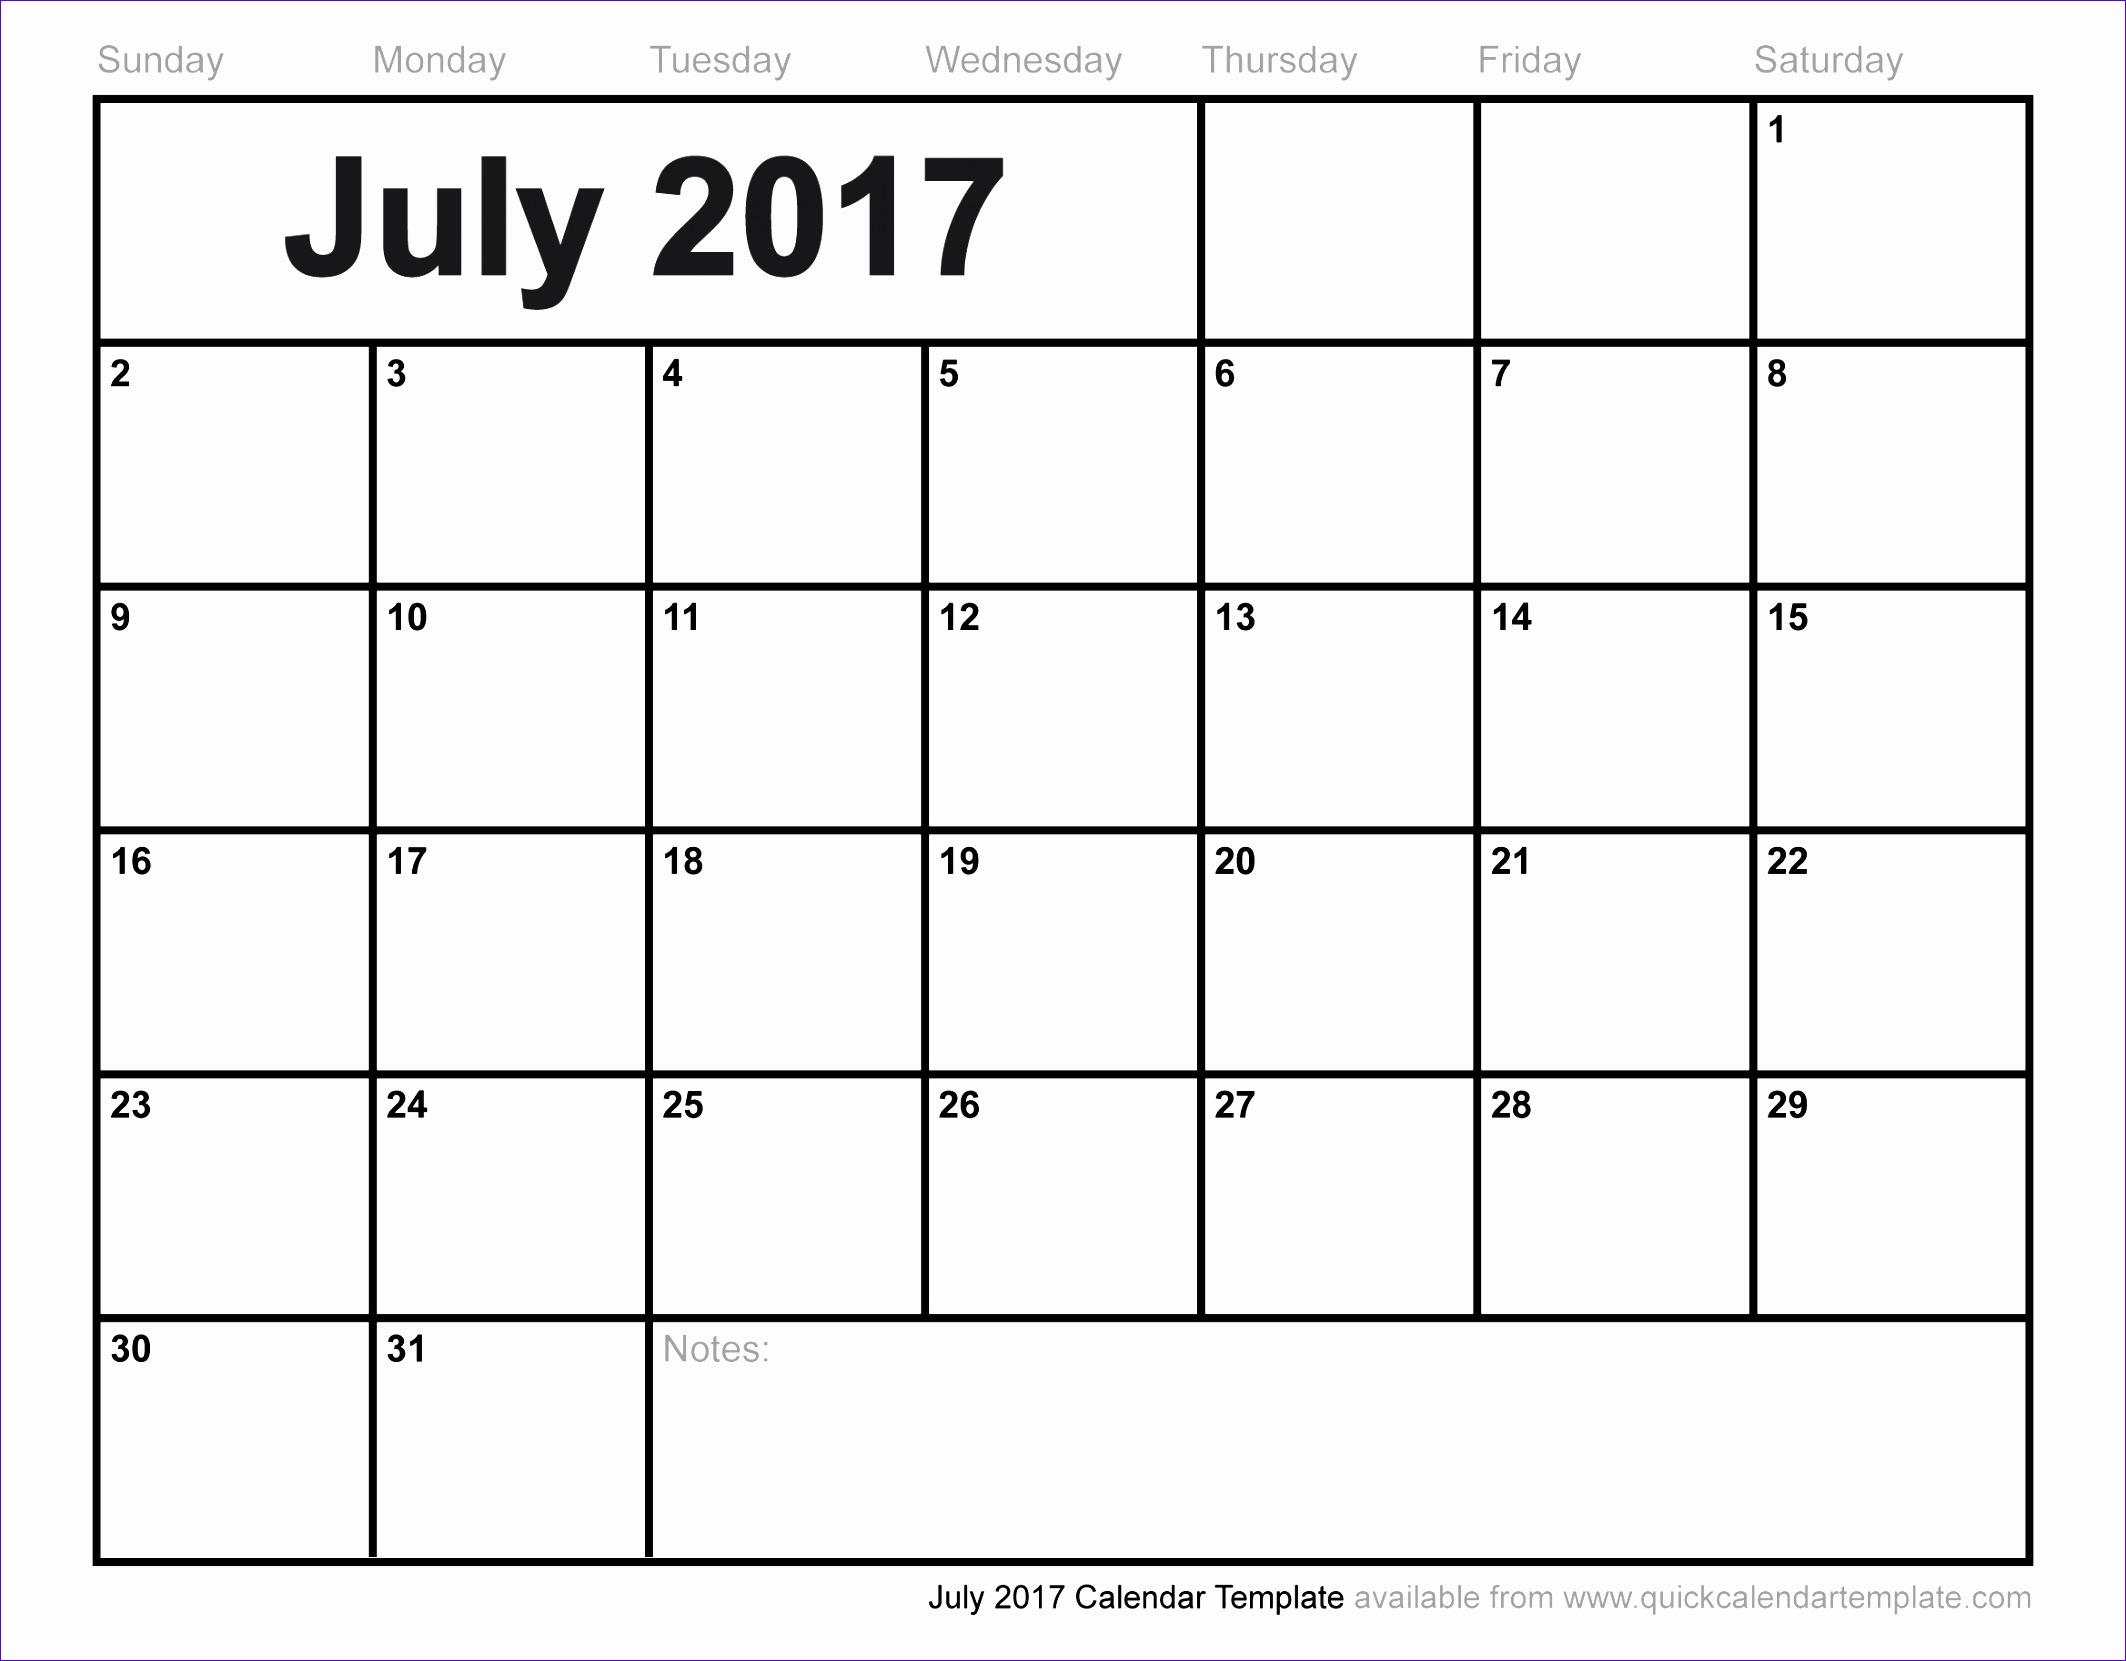 blank july 2017 calendar 1909 21261661